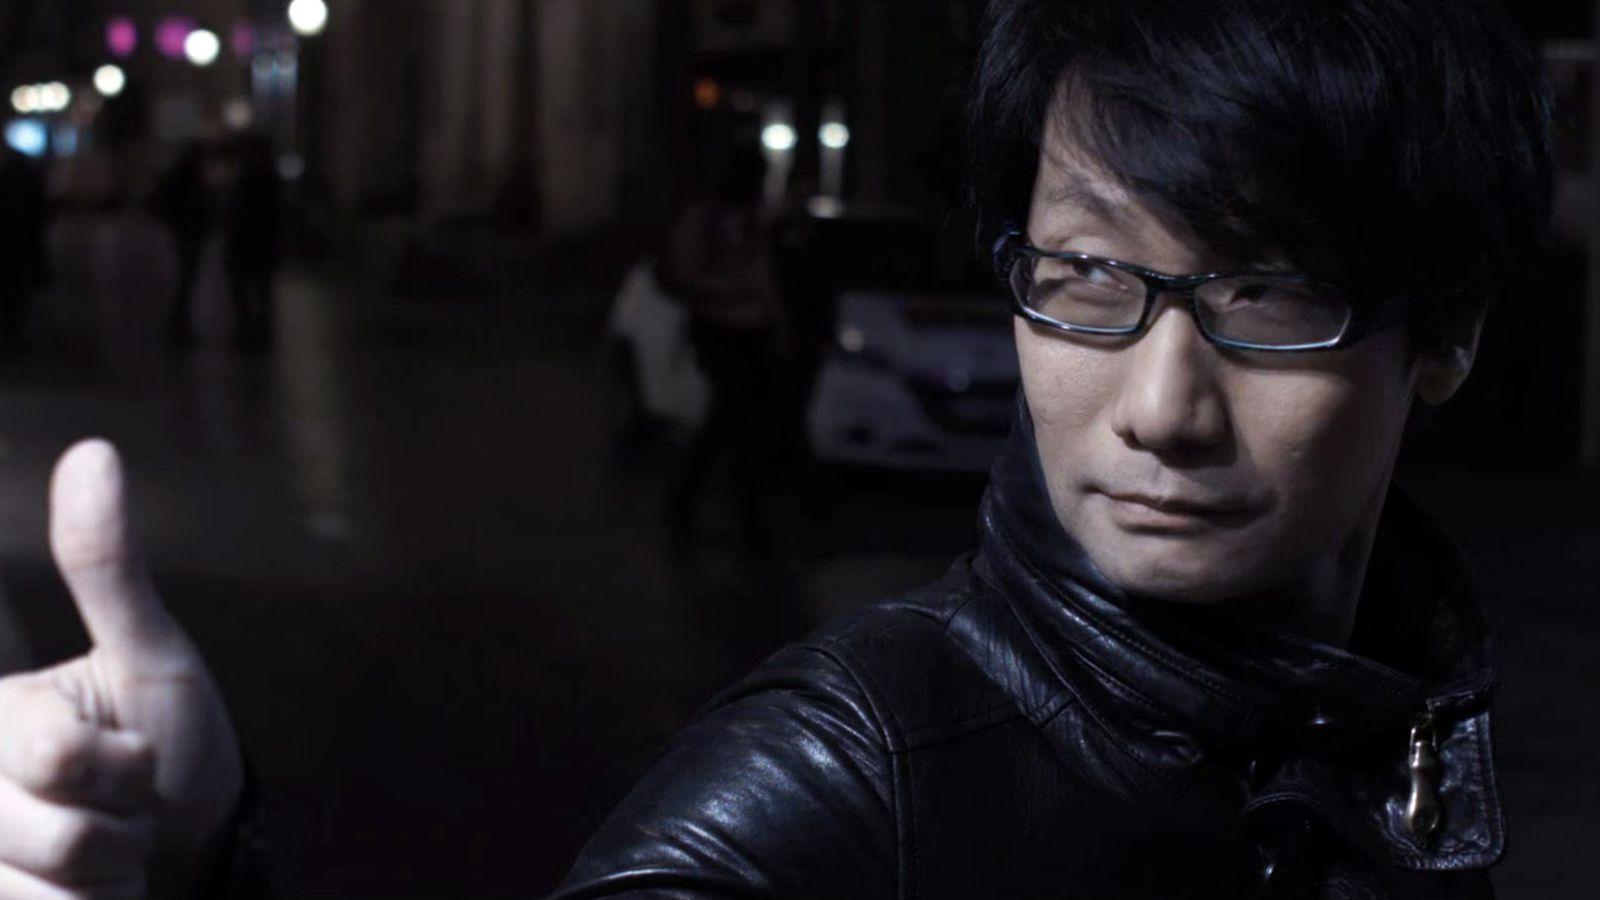 Report Hideo Kojima Has Officially Left Konami Forming